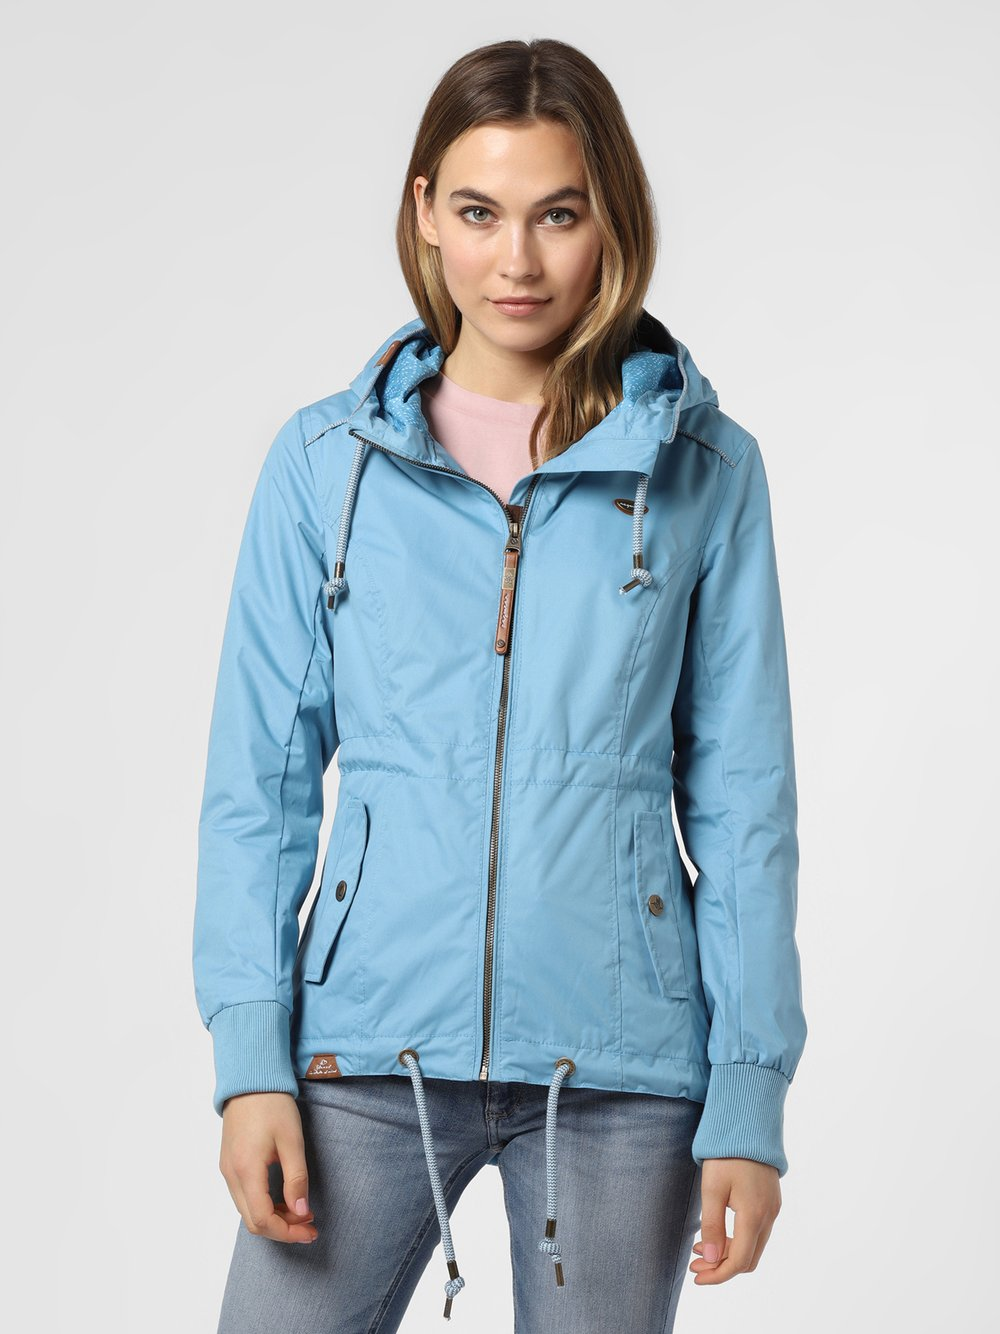 Ragwear – Kurtka damska – Danka, niebieski Van Graaf 475043-0001-09900